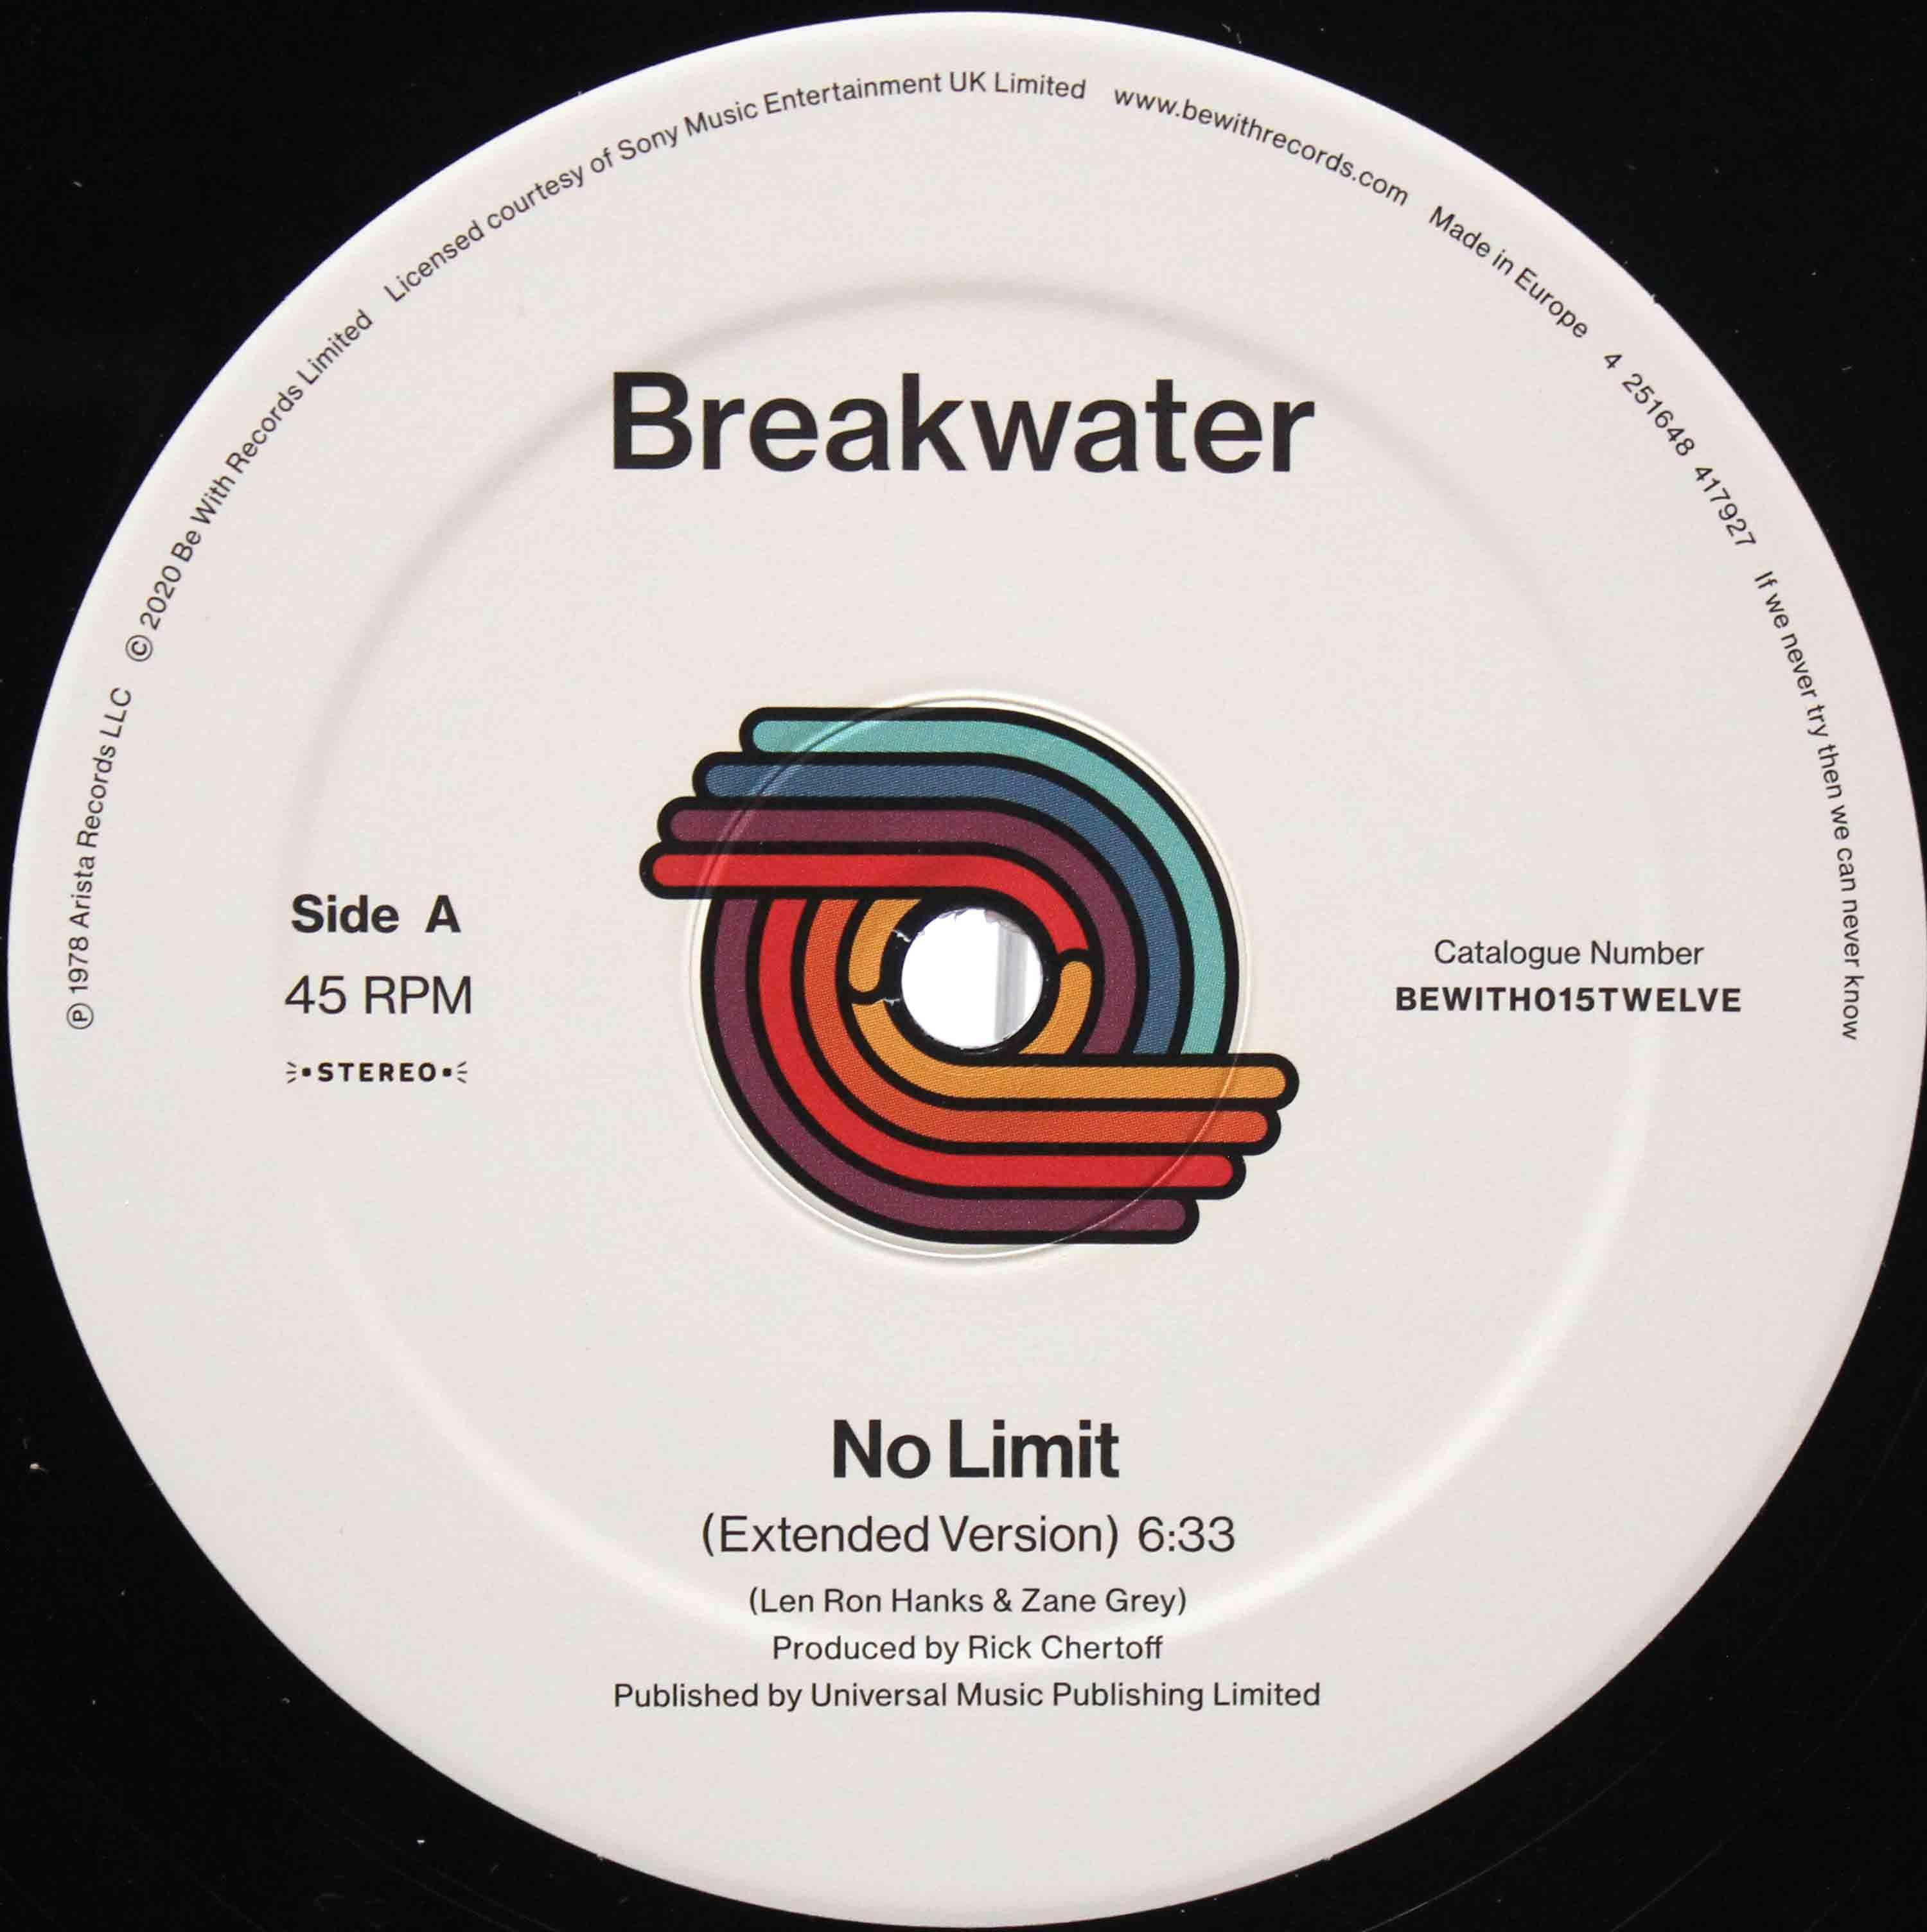 Breakwater - No limit Reisuee UK 03